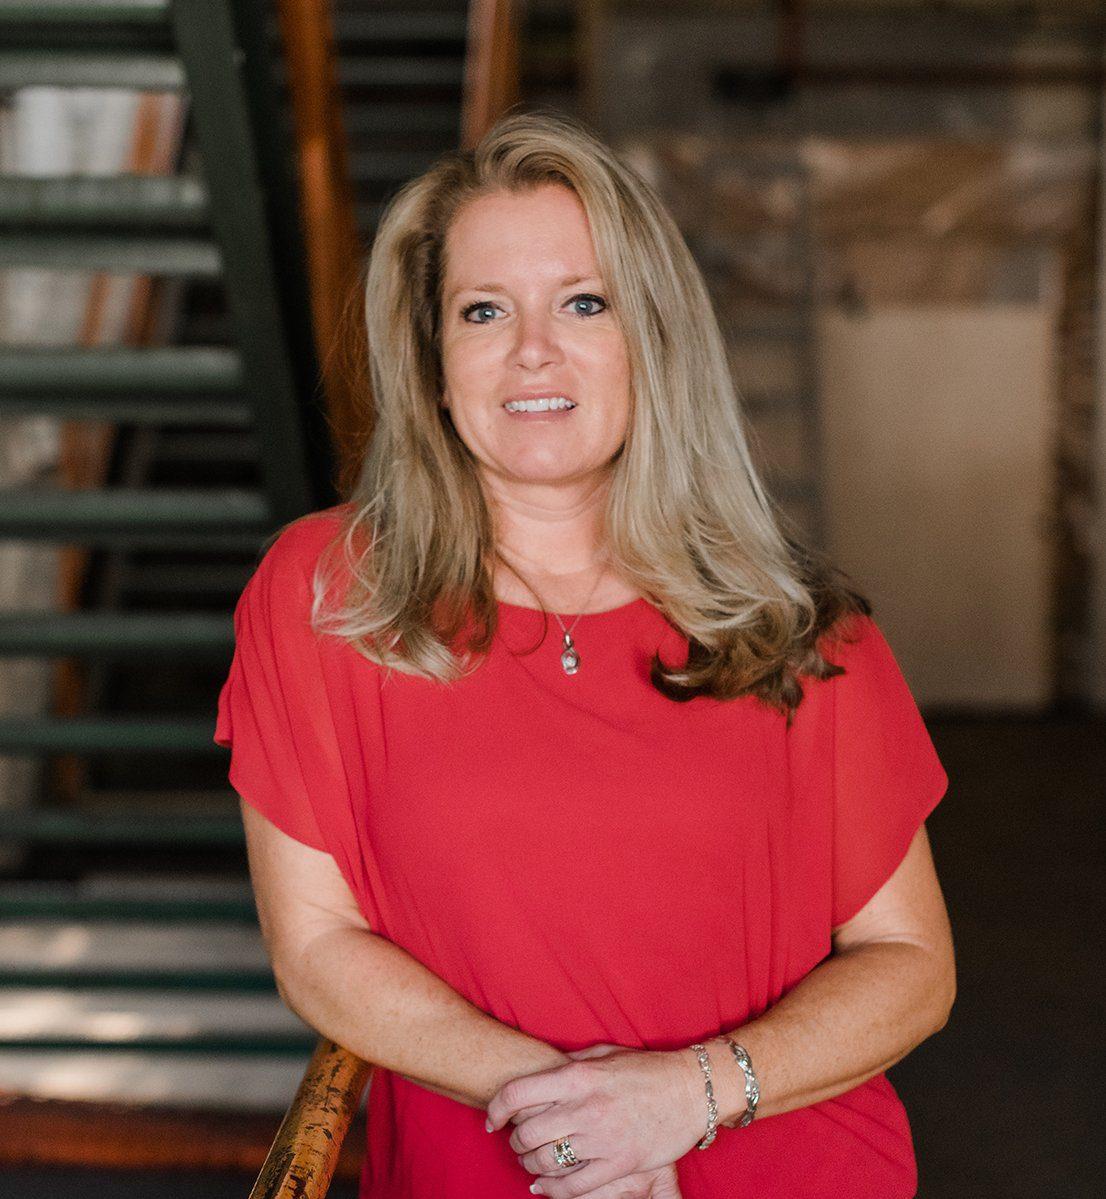 LS Black Announces the Addition of Danielle Johnson – Construction Executive